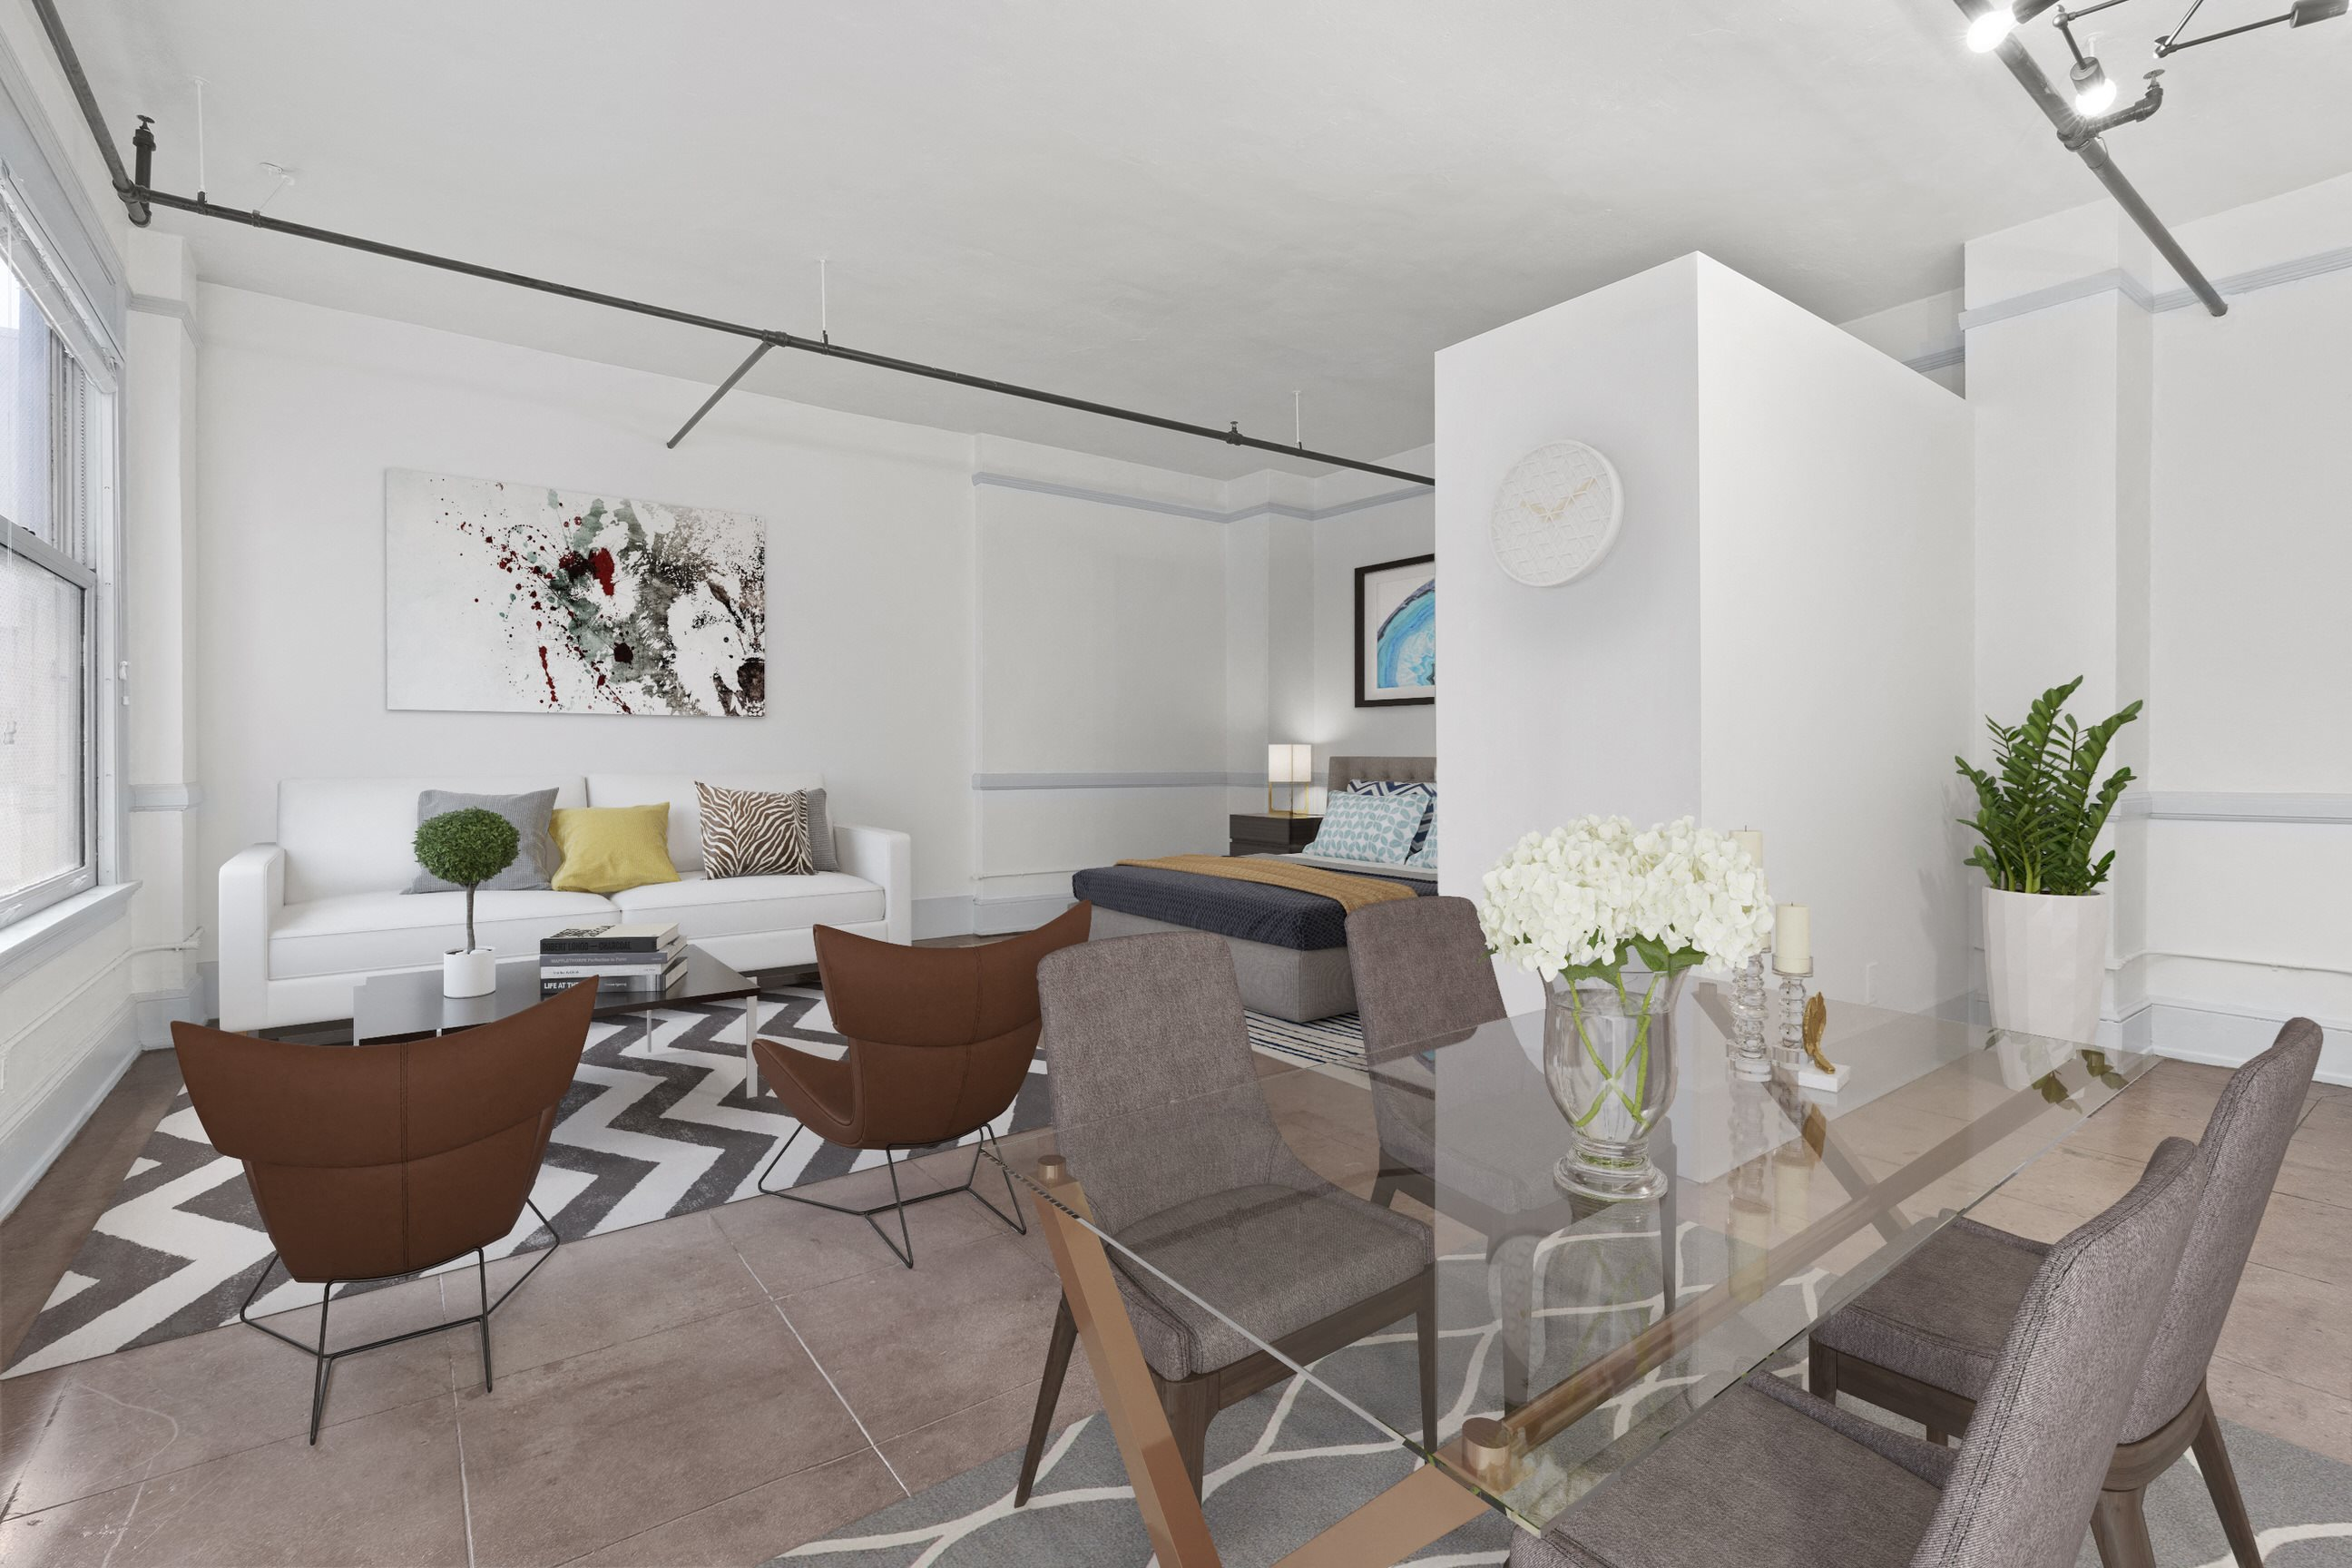 Living Area at Santa Fe Lofts, 121 E 6th Street, Downtown Los Angeles, CA 90014